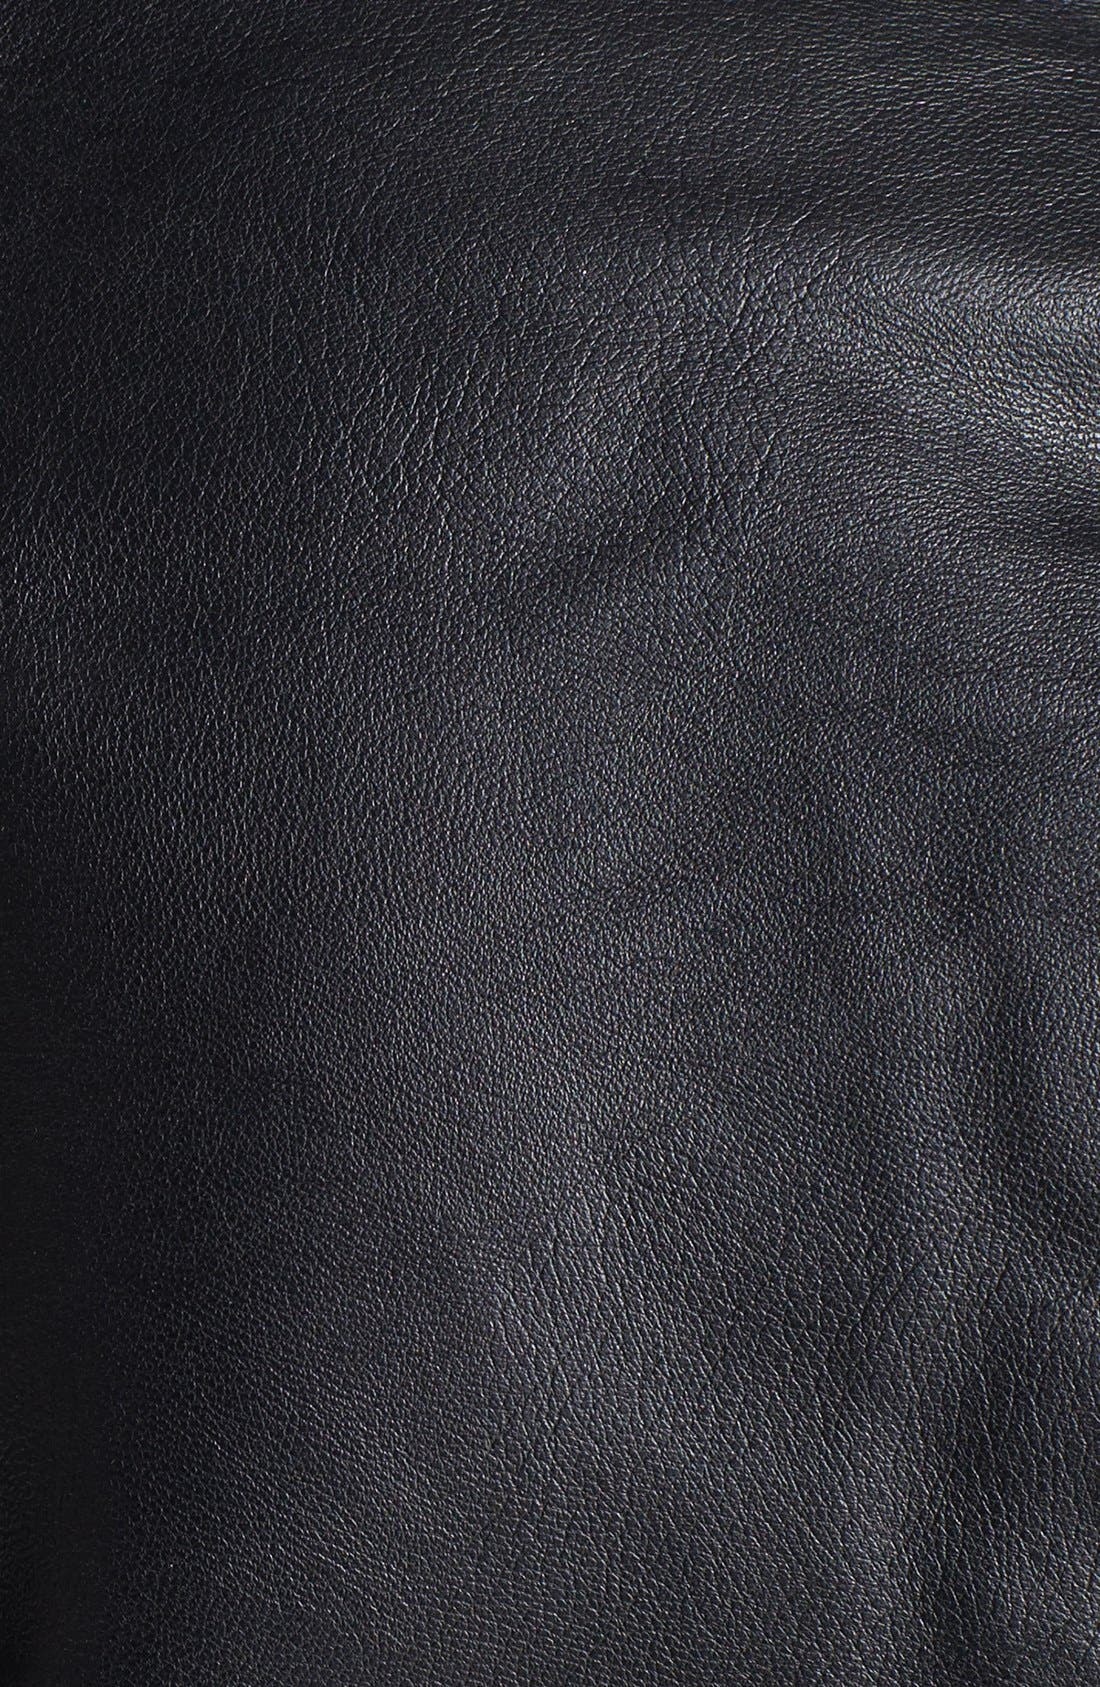 Alternate Image 3  - BLANKNYC 'Black Light' Faux Shearling Lined Faux Leather Jacket